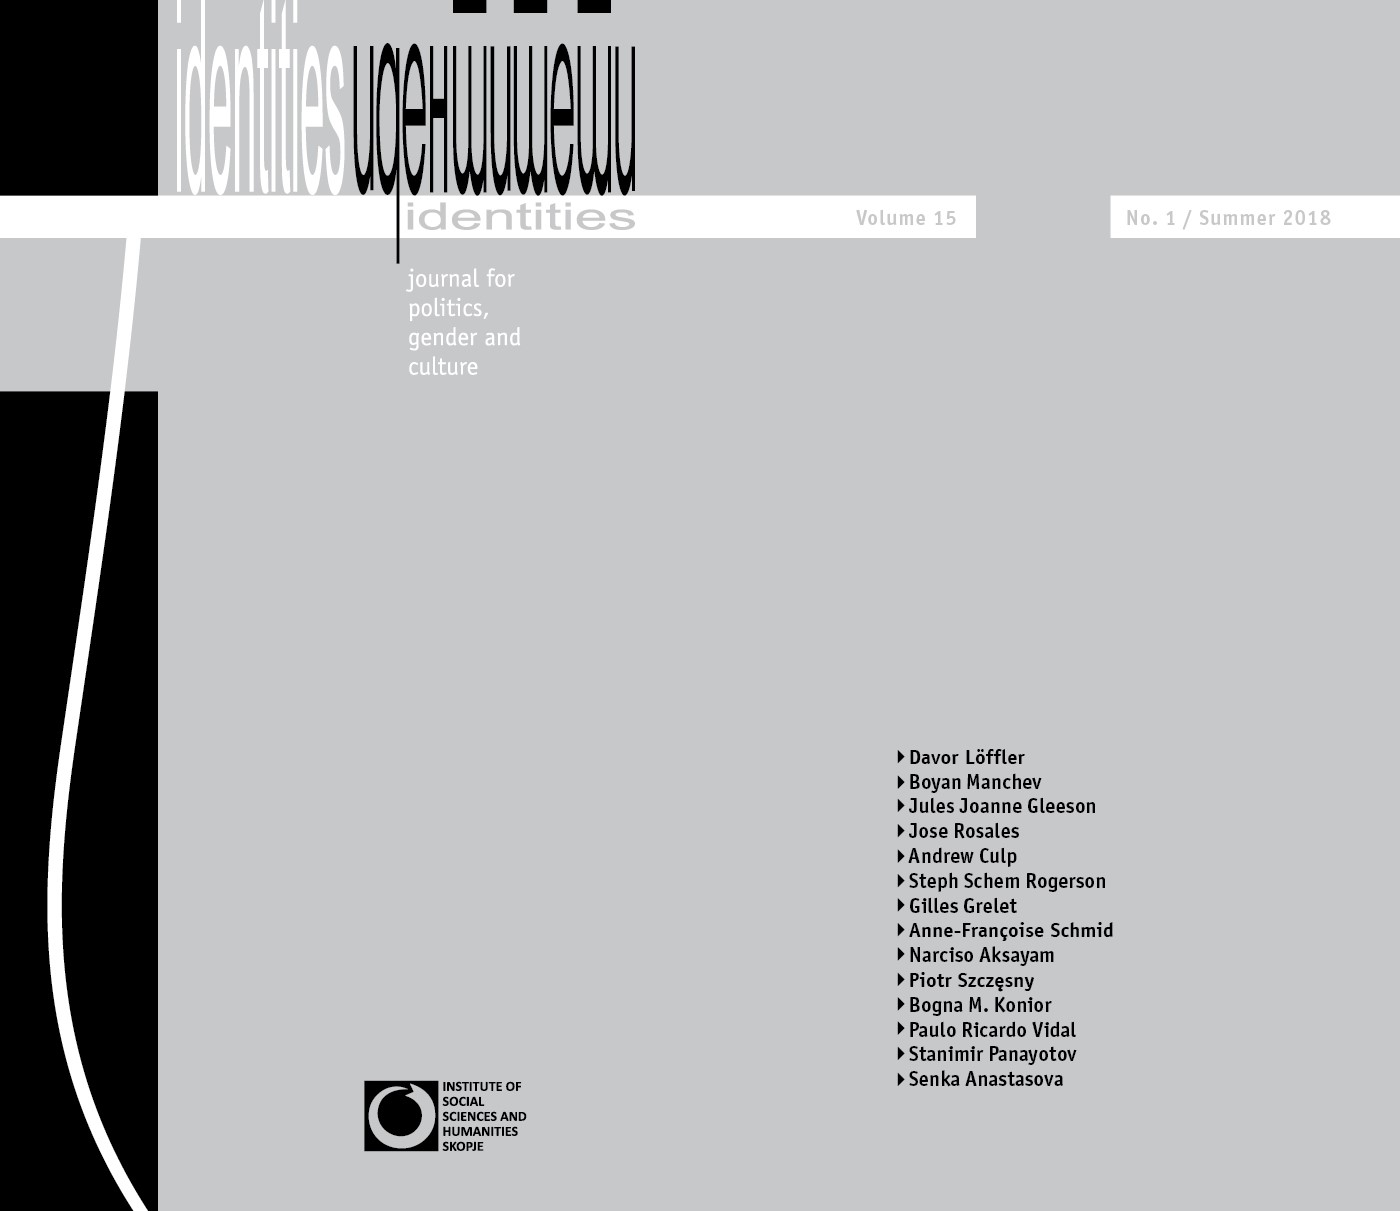 View Vol. 15 No. 1-2 (2018): Vol. 15, No. 1-2 (Summer - Winter 2018) - Issue No. 28-29